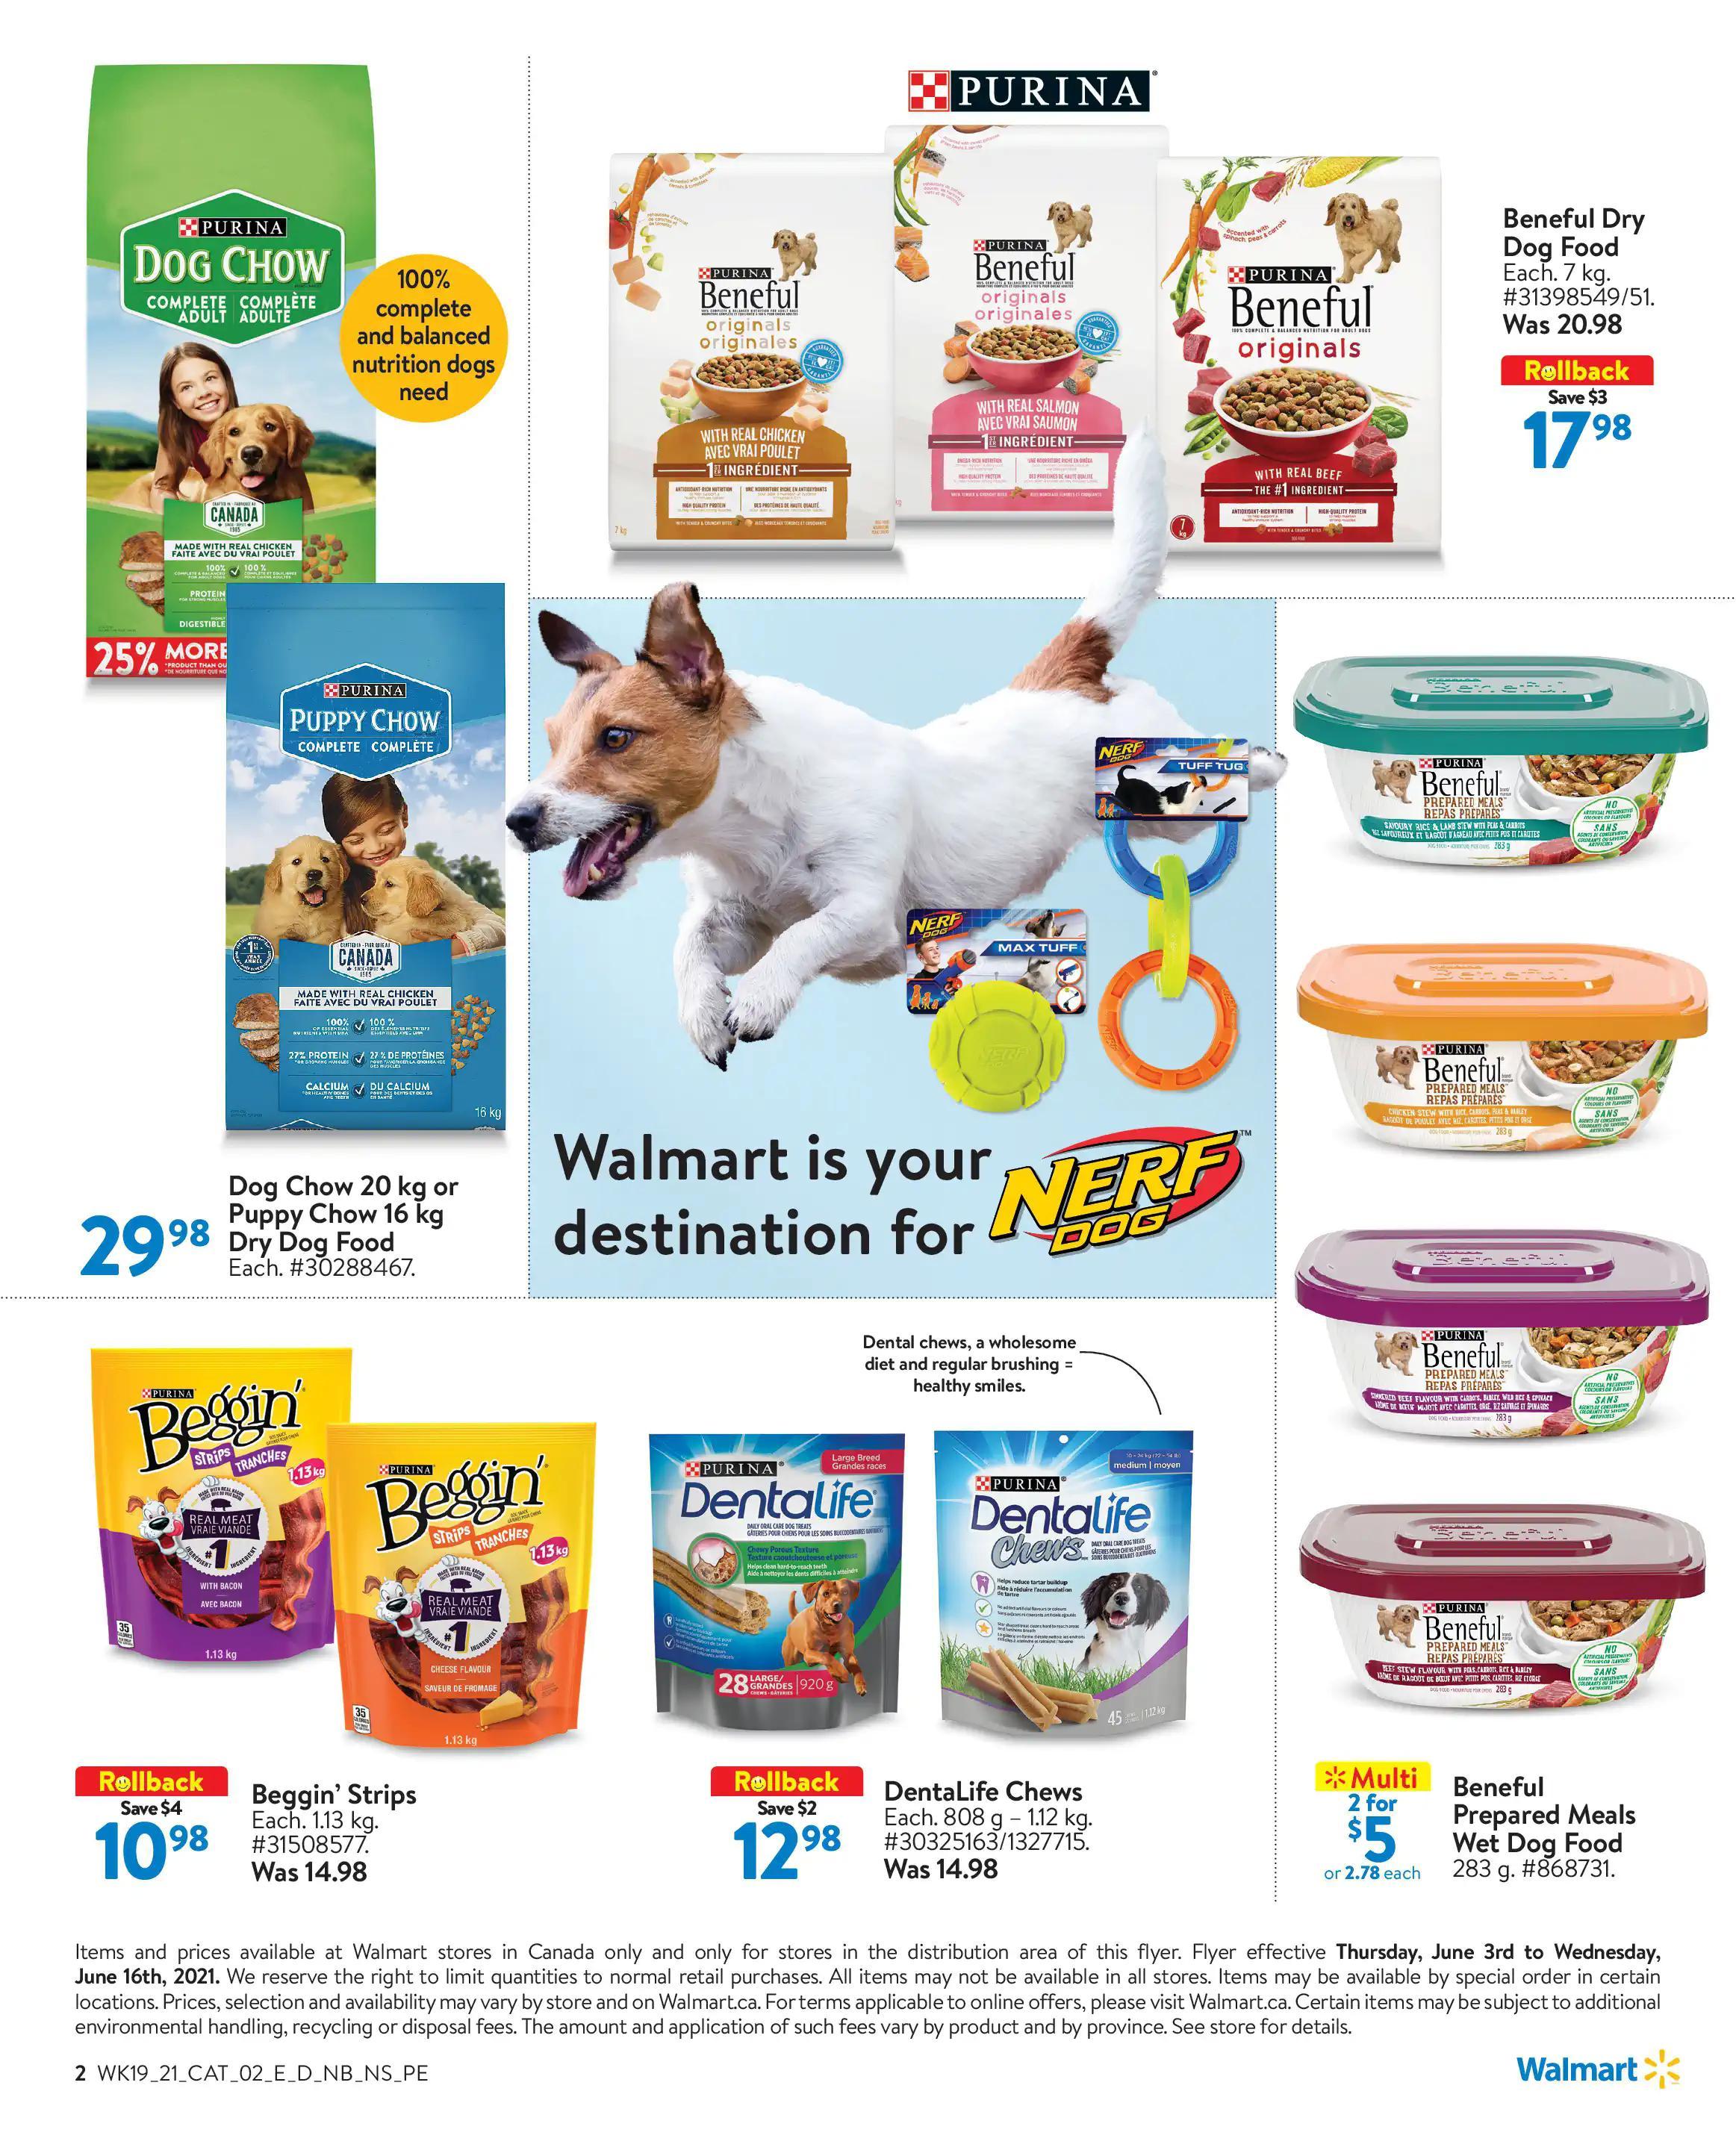 Walmart - Pets - Page 2